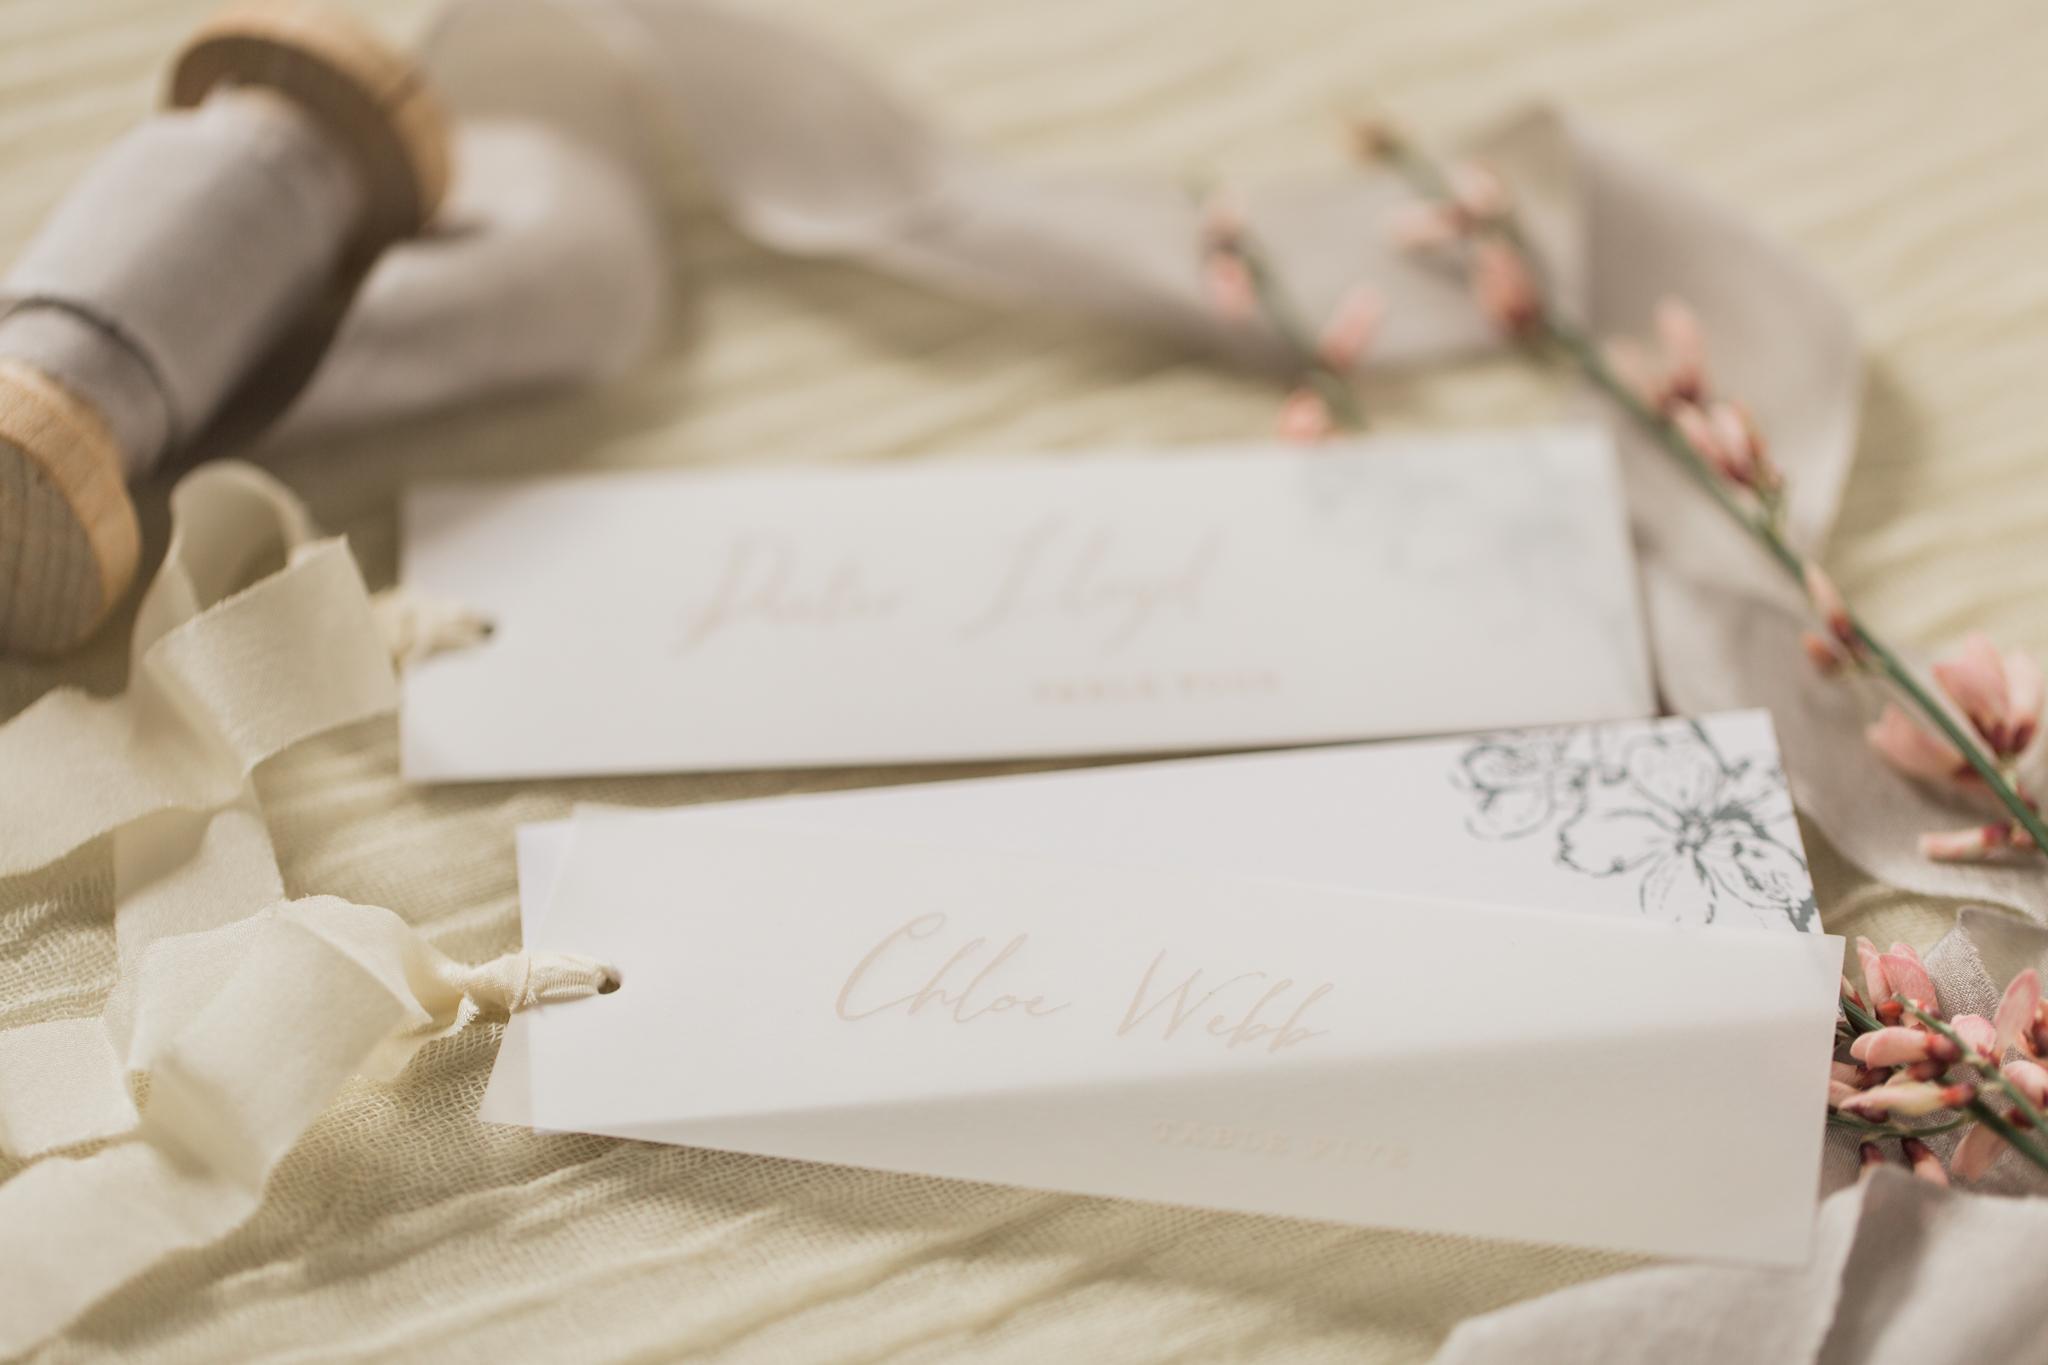 Inkflower Press Plum Blossom silkscreen printed wedding place cards - Blush Slate